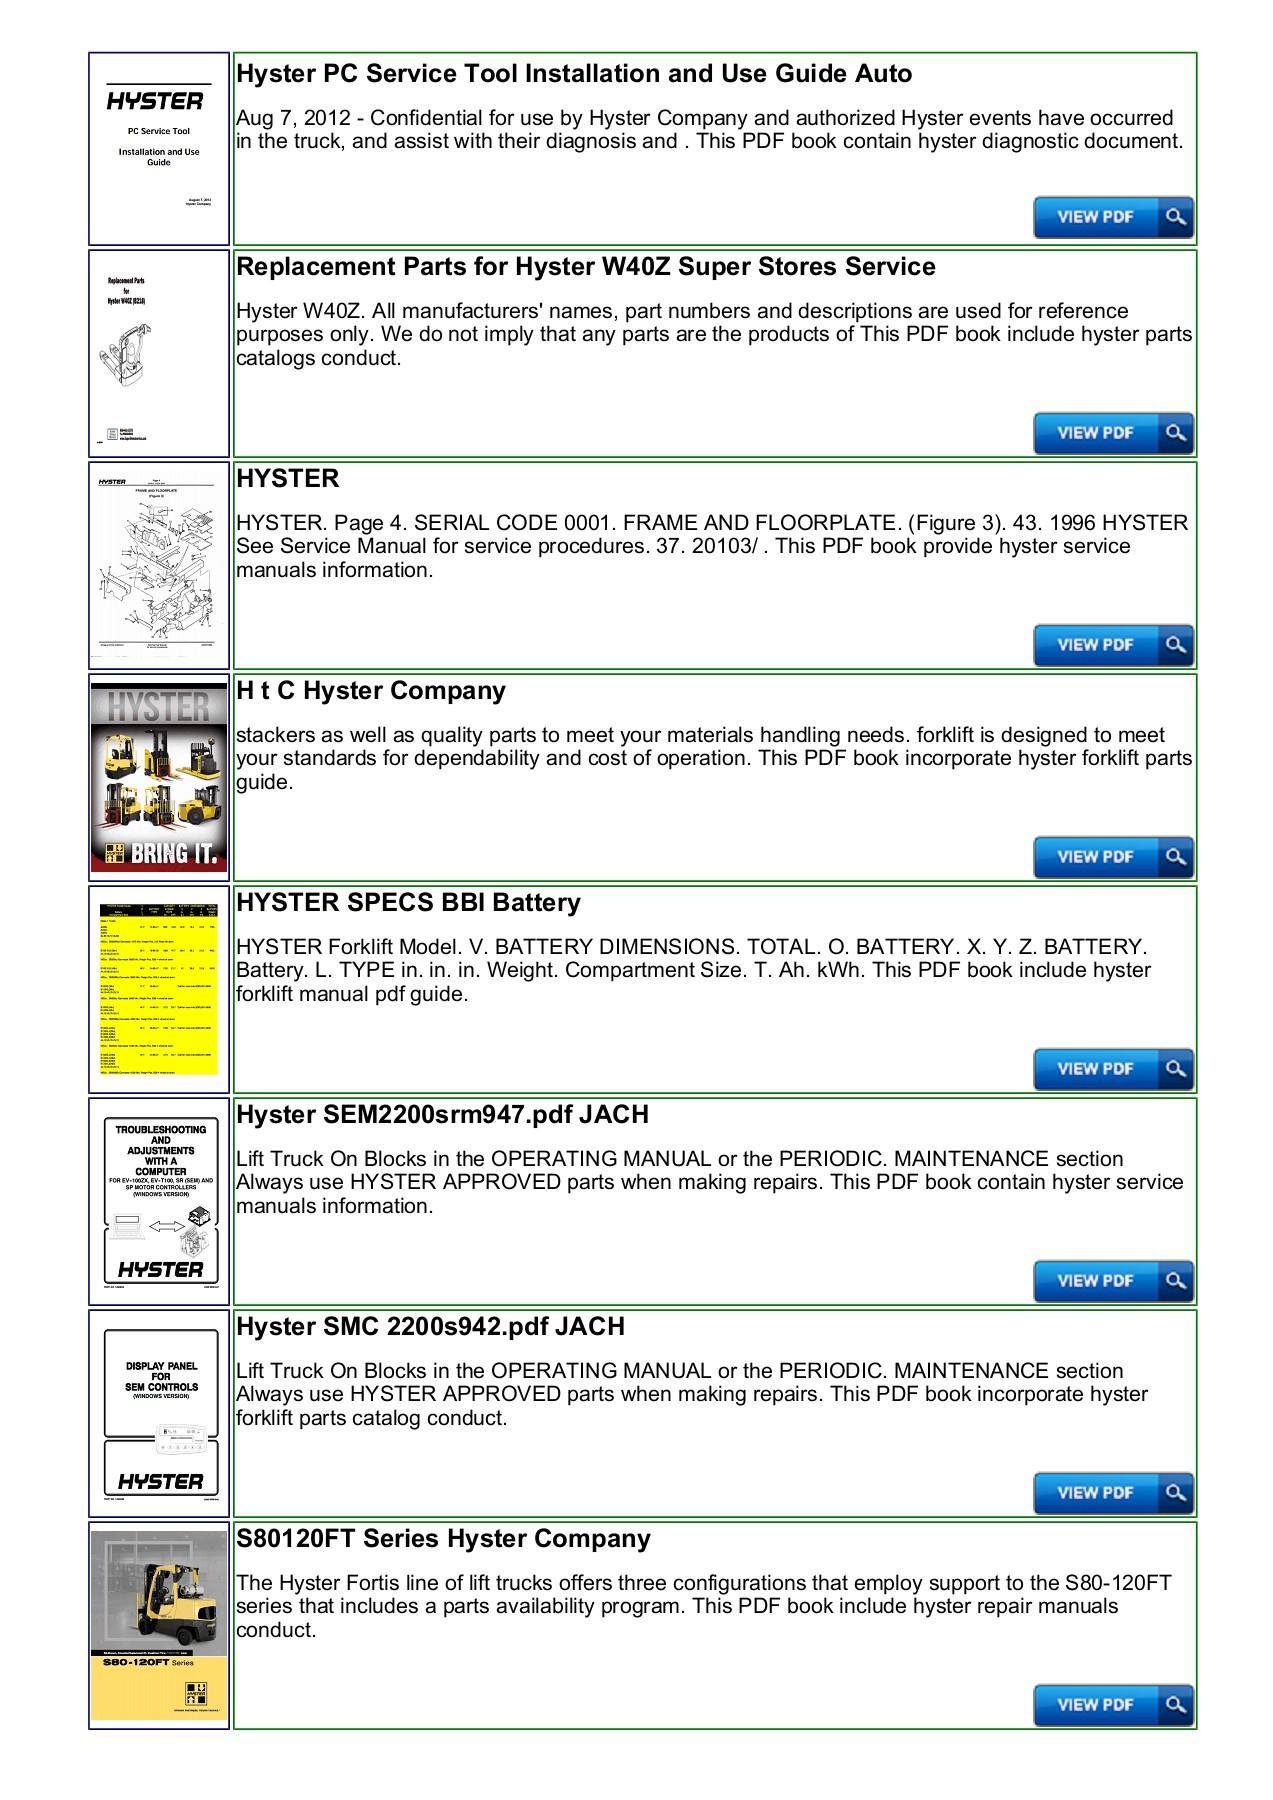 Trc Level Guide Ebook Electrocircuitsblogspotcom High Temperature Indicator Circuit Array Vw Golf 5 Poistky Schema Rh Risingstarstv Net